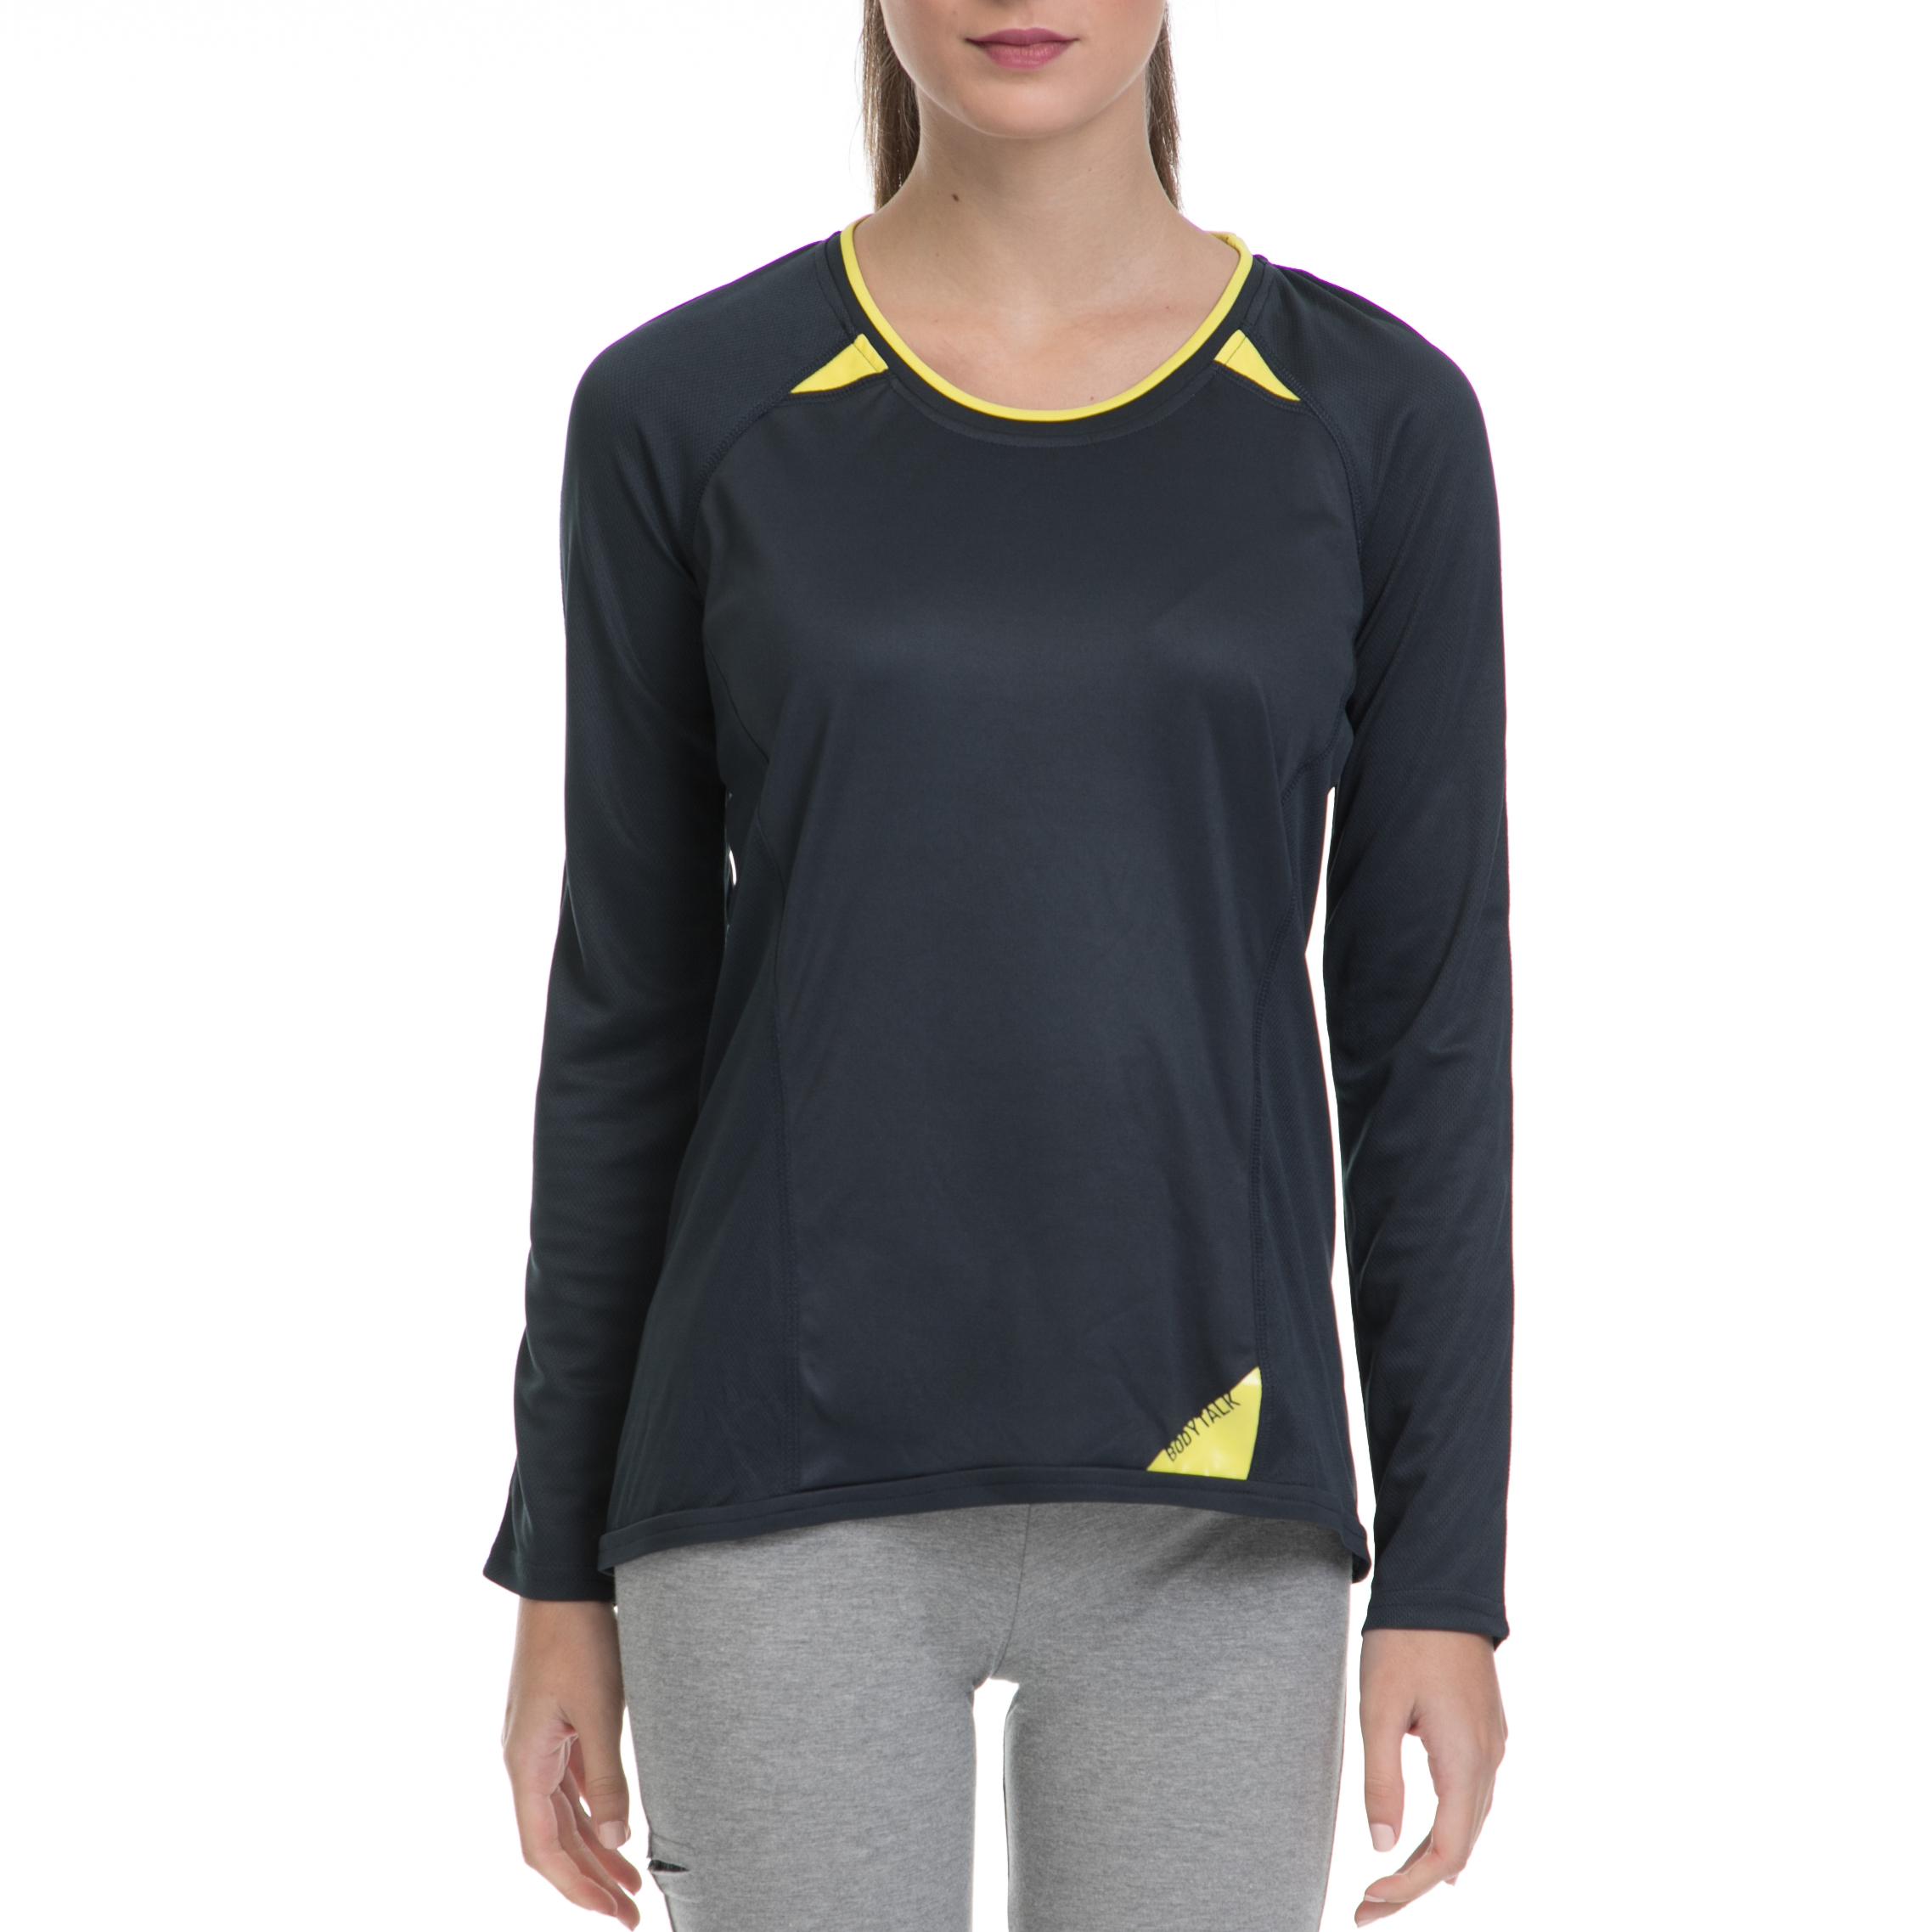 BODYTALK - Γυναικεία αθλητική μπλούζα PLAYGROUNDW BODYTALK γκρι γυναικεία ρούχα αθλητικά φούτερ μακρυμάνικα